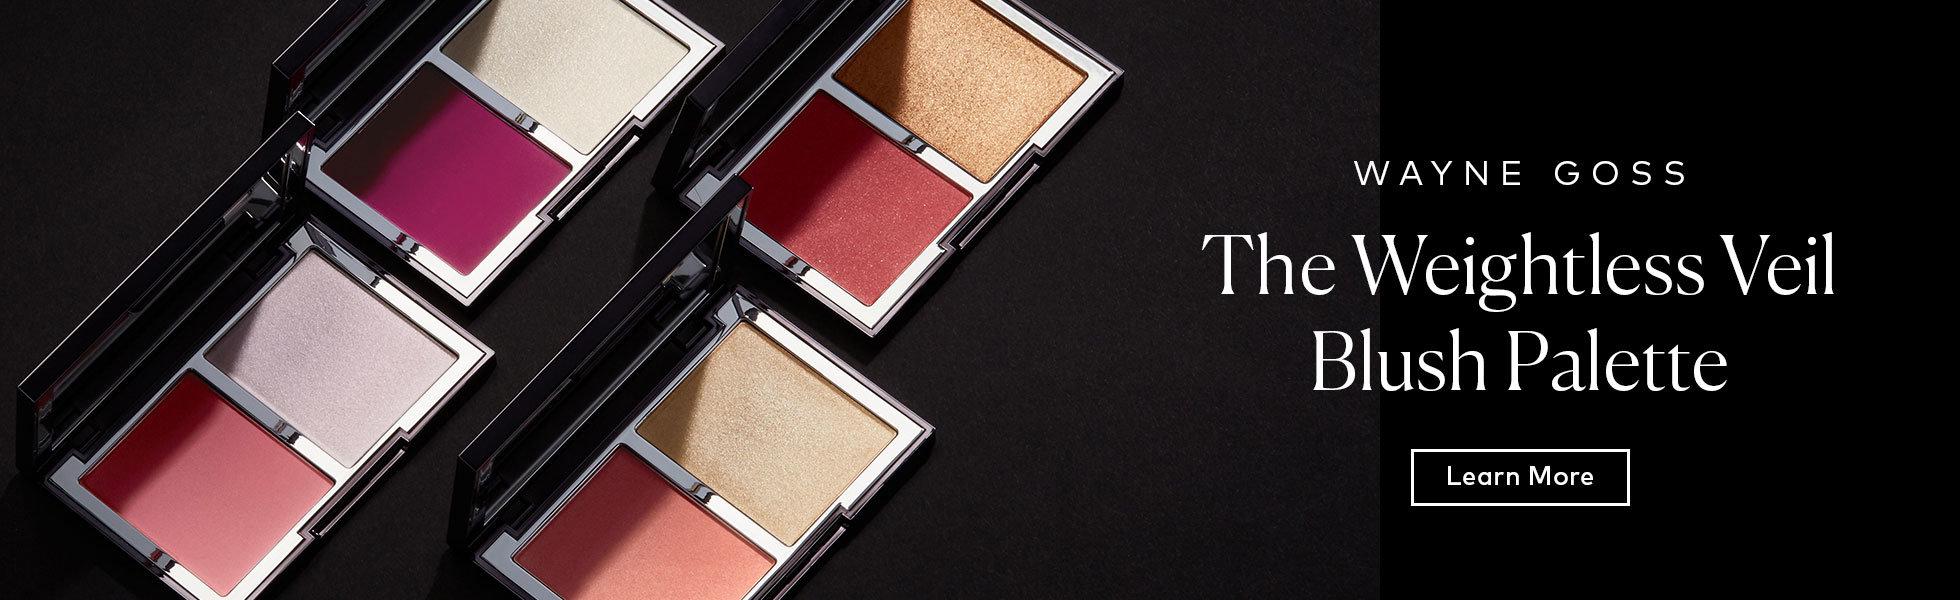 Shop Wayne Goss The Weightless Veil Blush Palettes on Beautylish.com